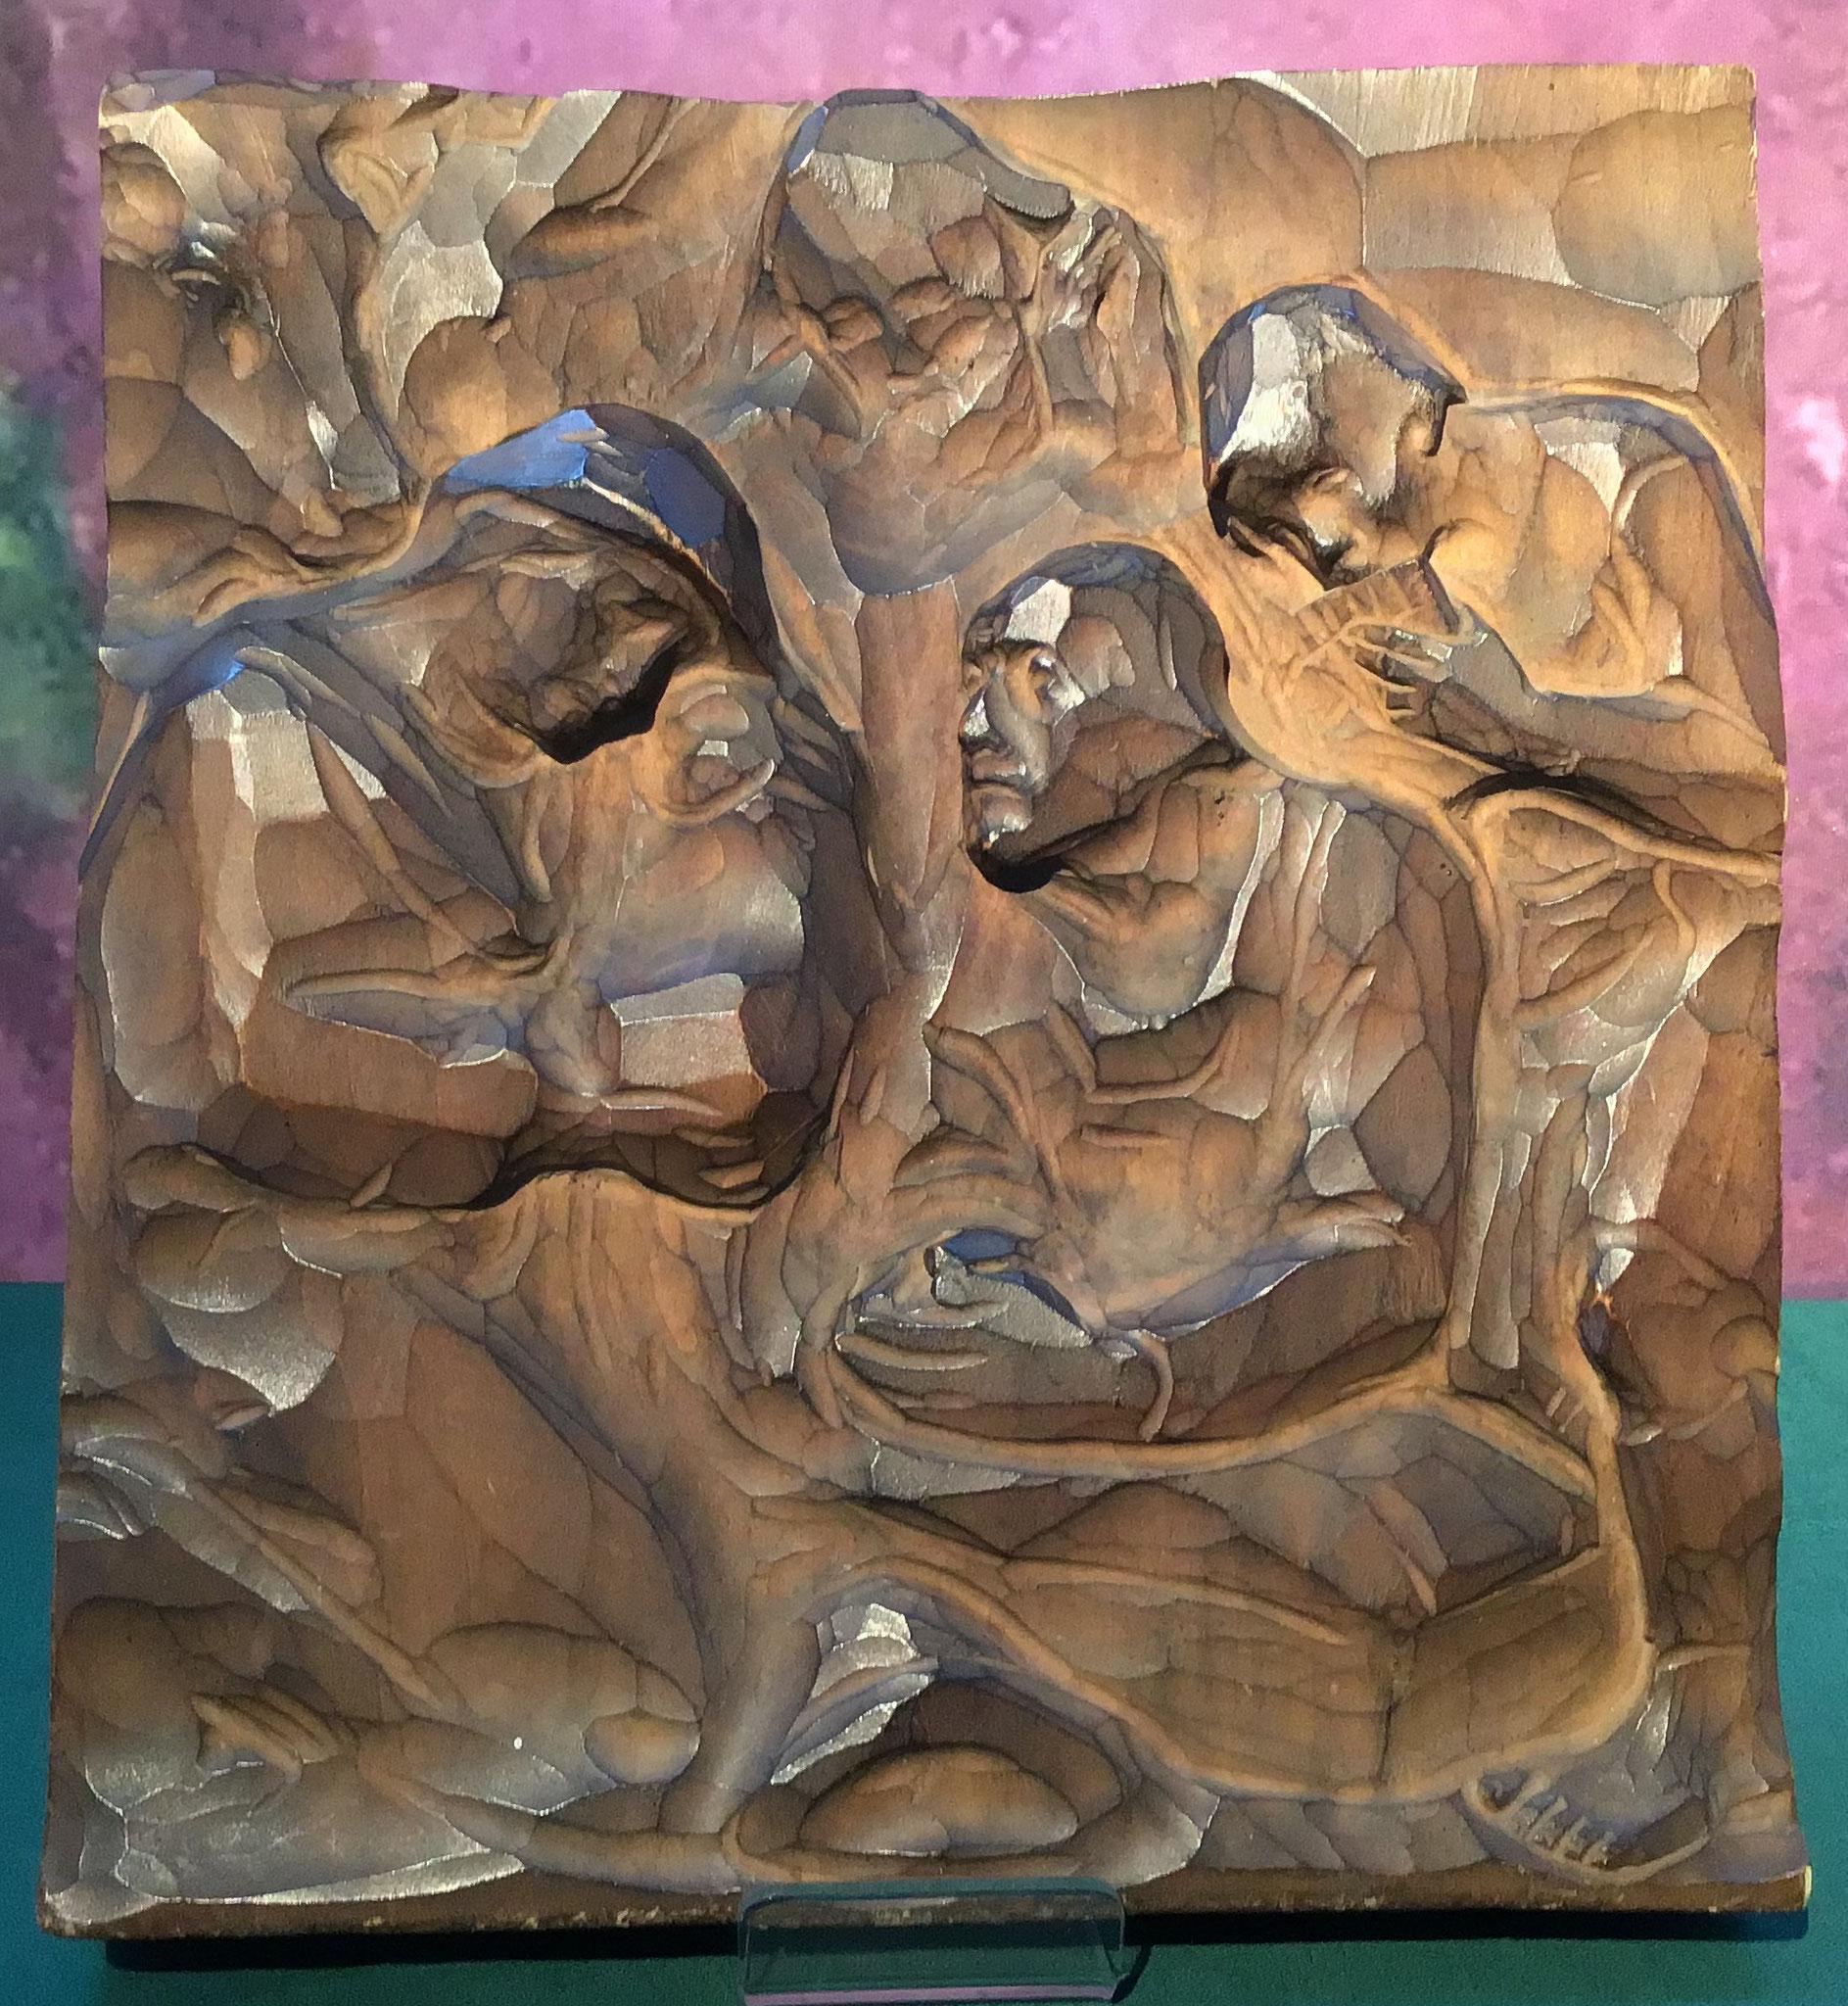 Relief mit Krippe, Ludwig Penz, um 1900, Tirol